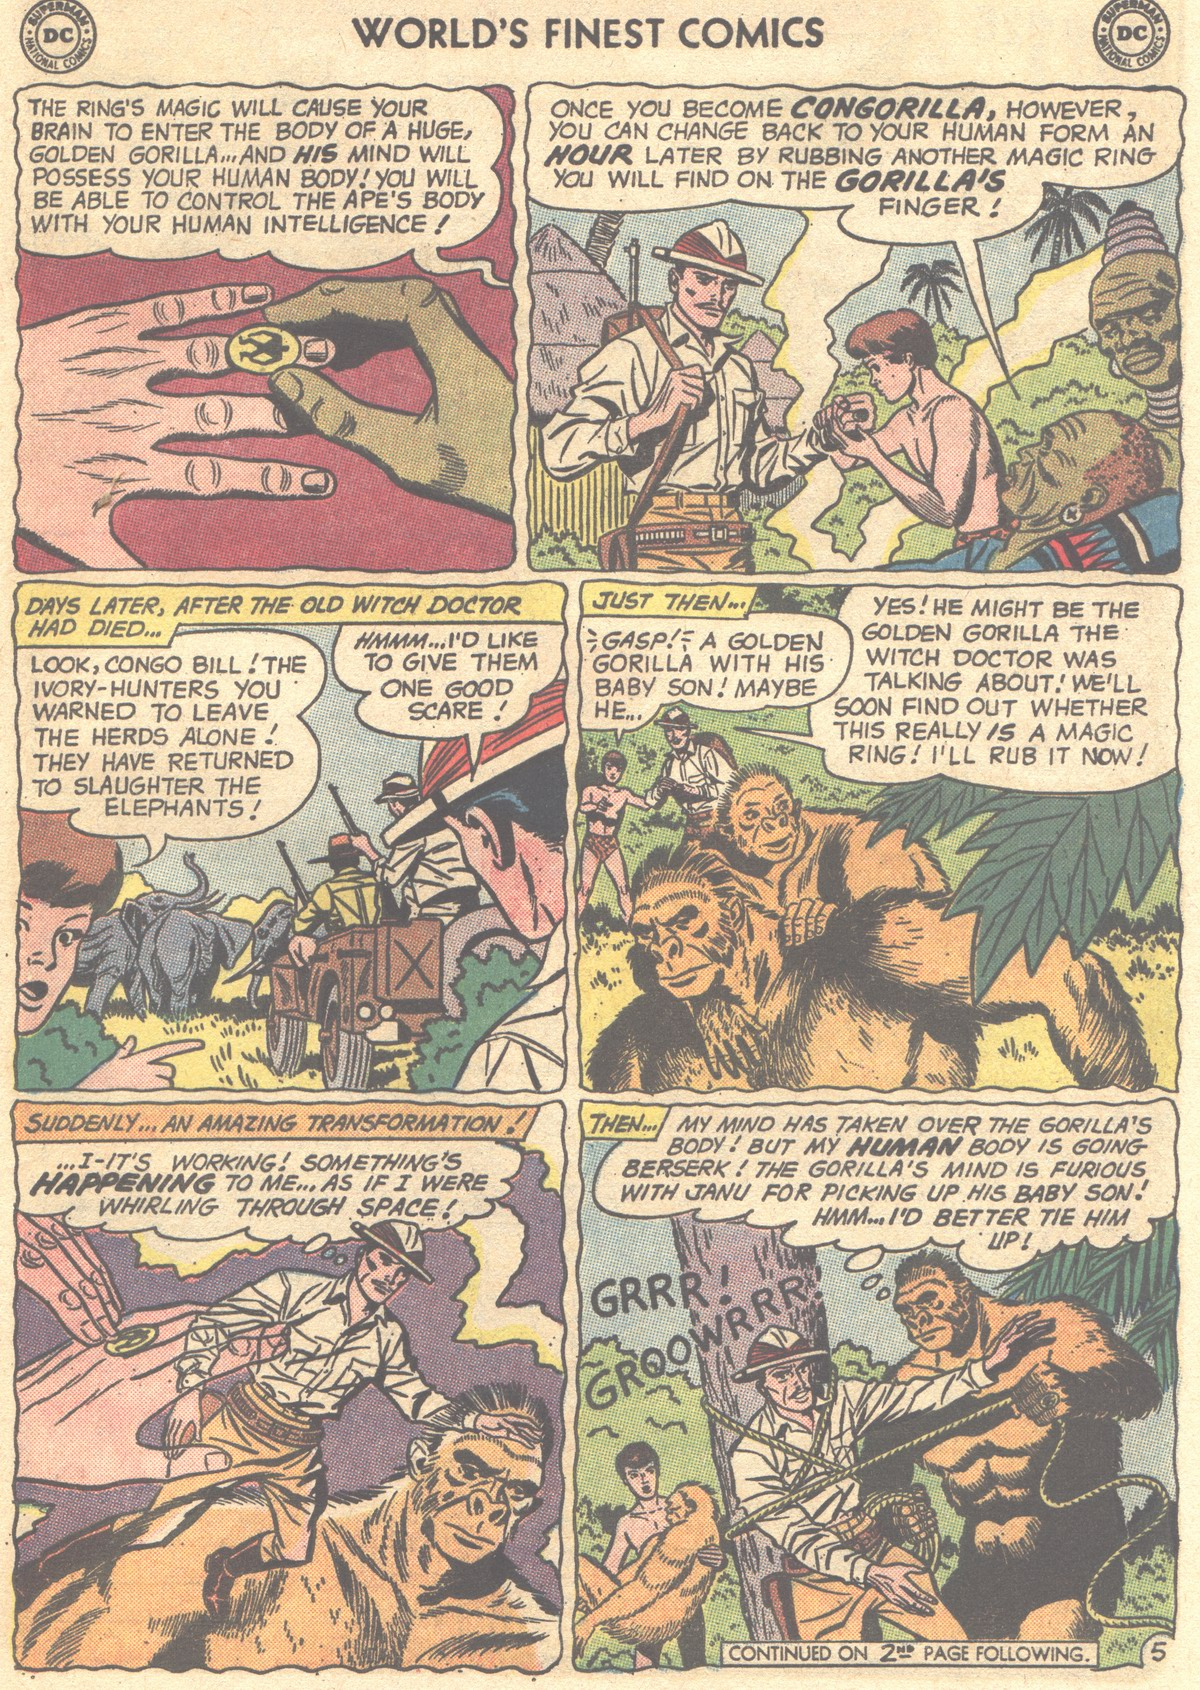 Read online World's Finest Comics comic -  Issue #148 - 29